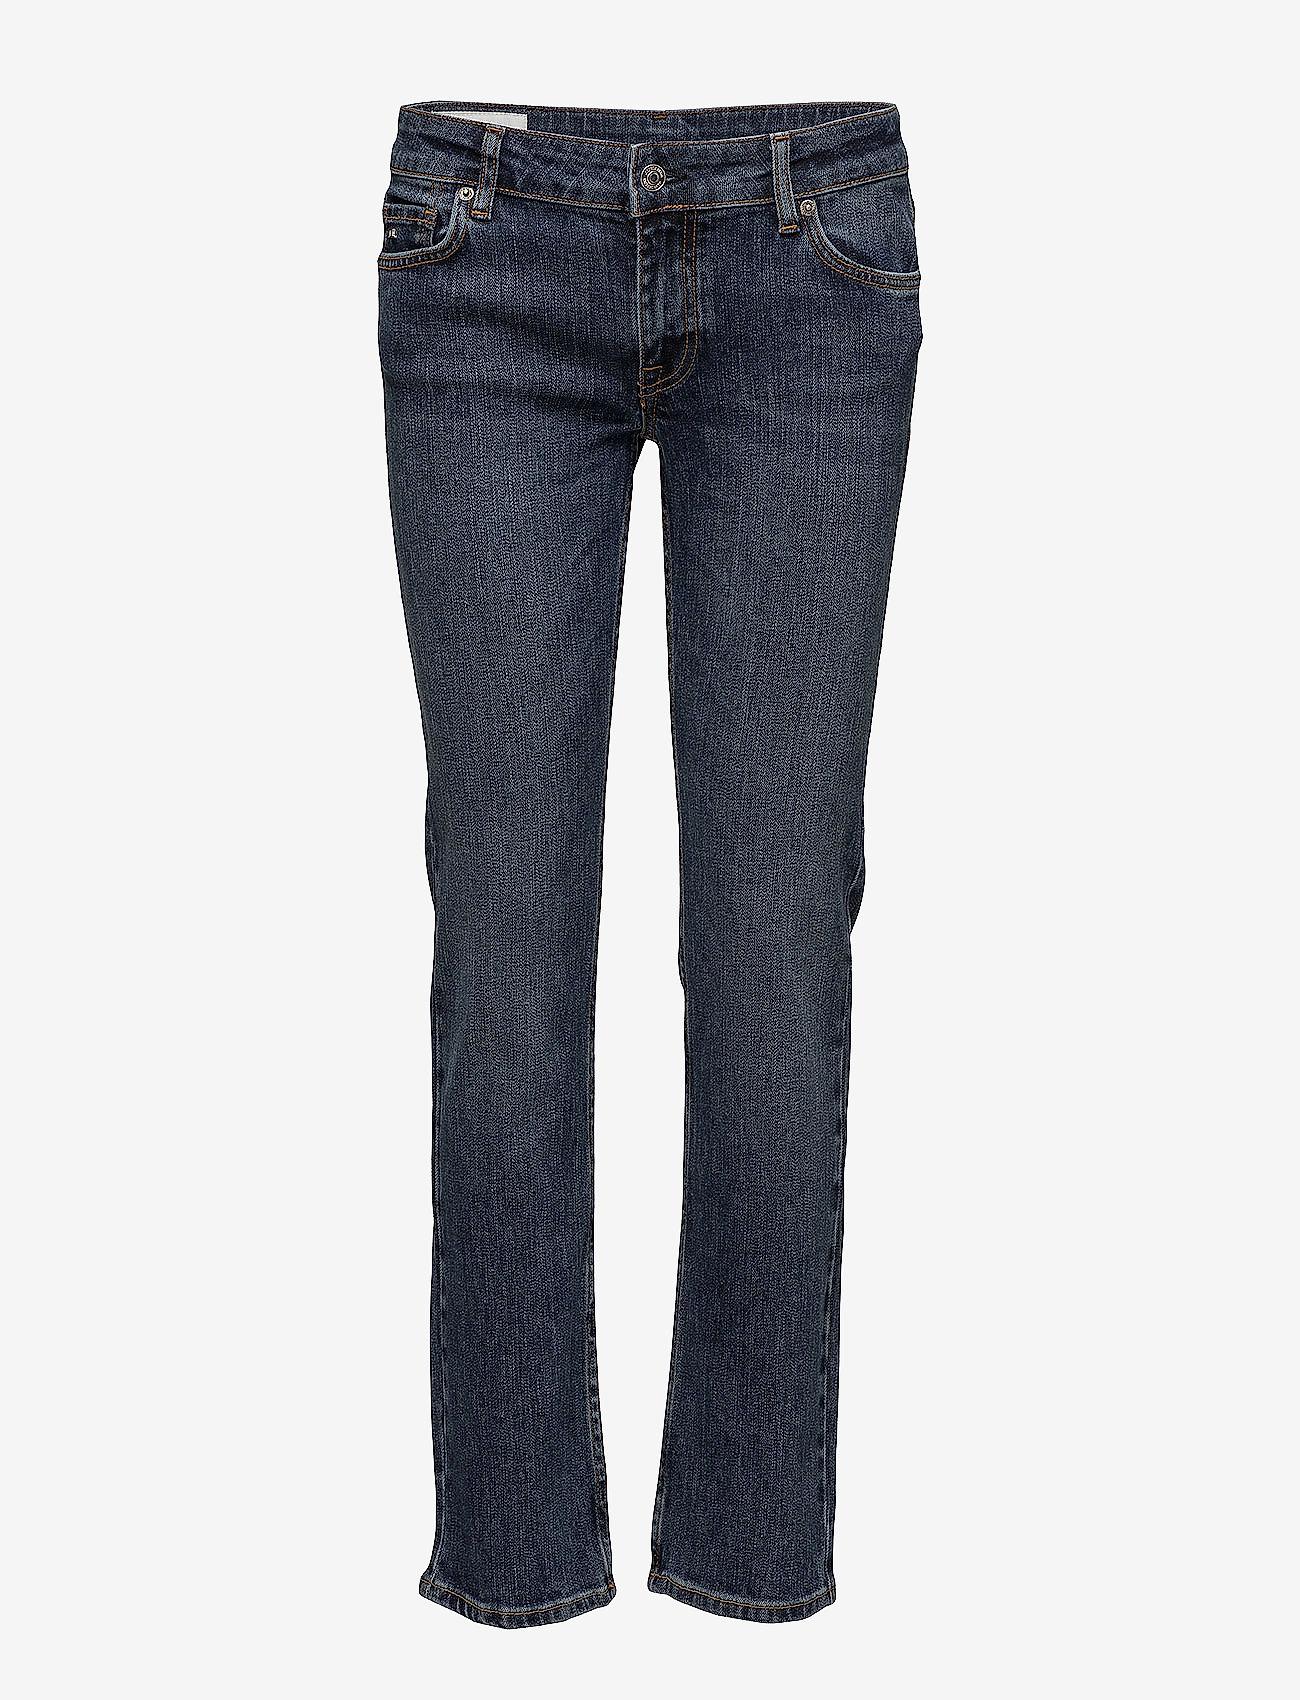 J. Lindeberg - Lowe Bowl - straight jeans - mid blue